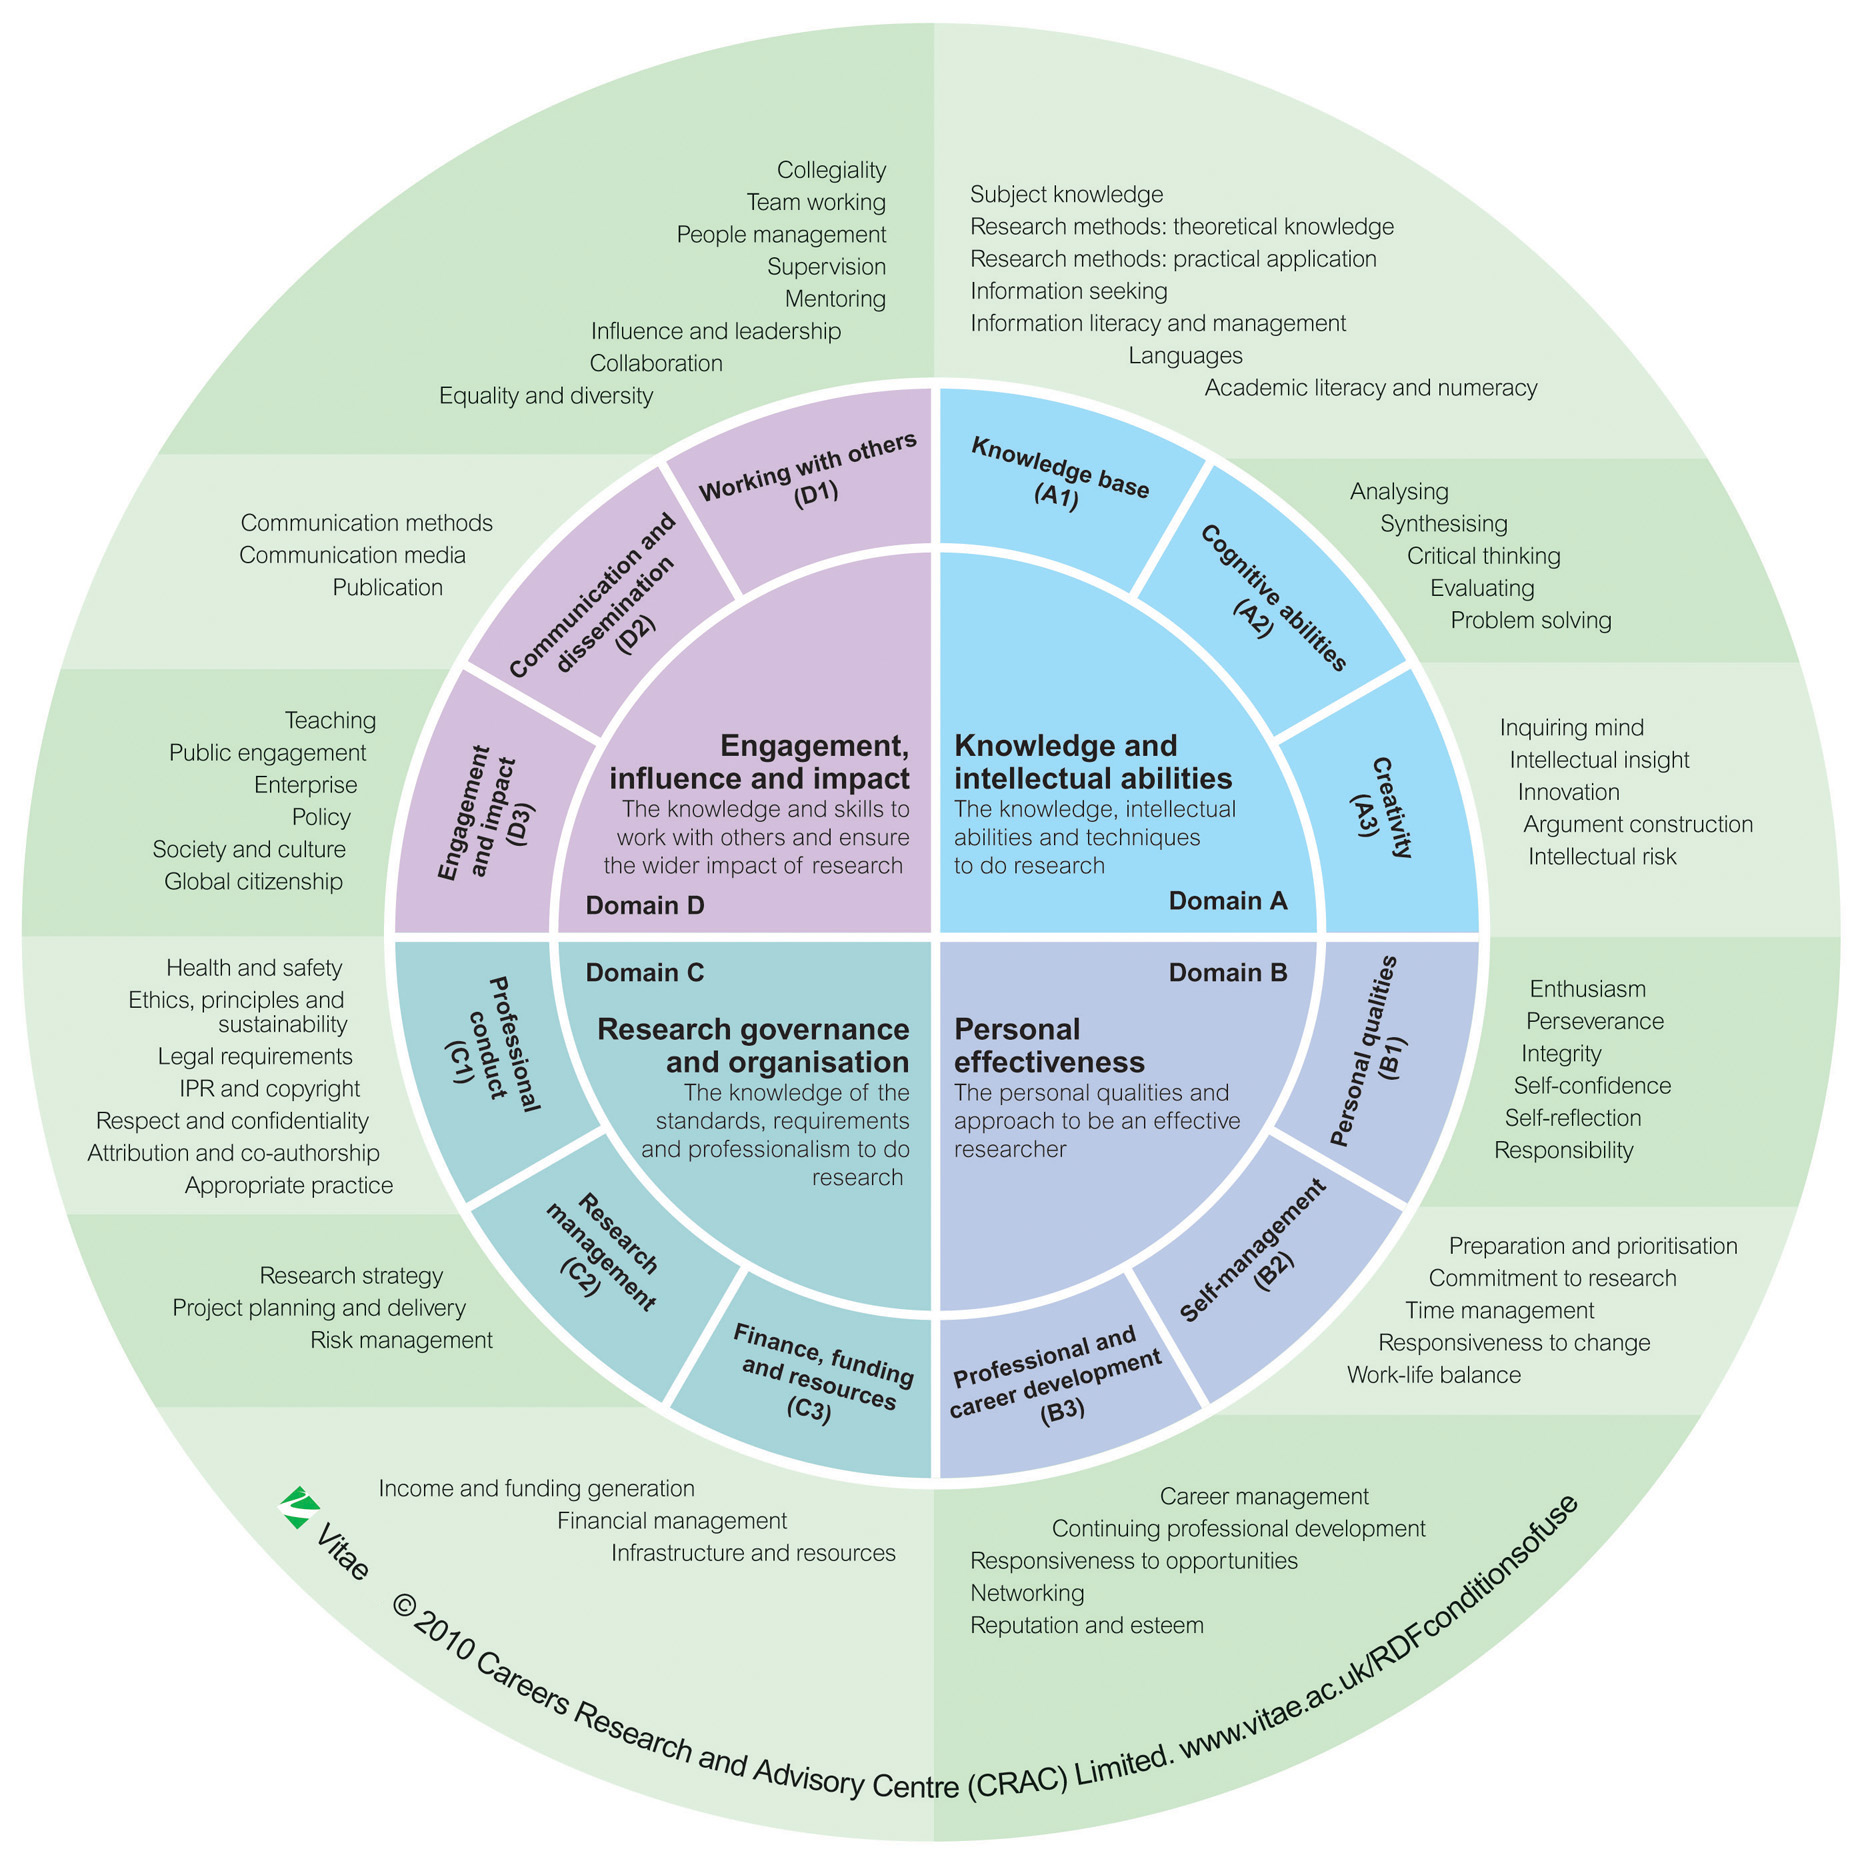 vitae-researcher-development-framework-rdf-full-content-graphic-2011-1.jpg